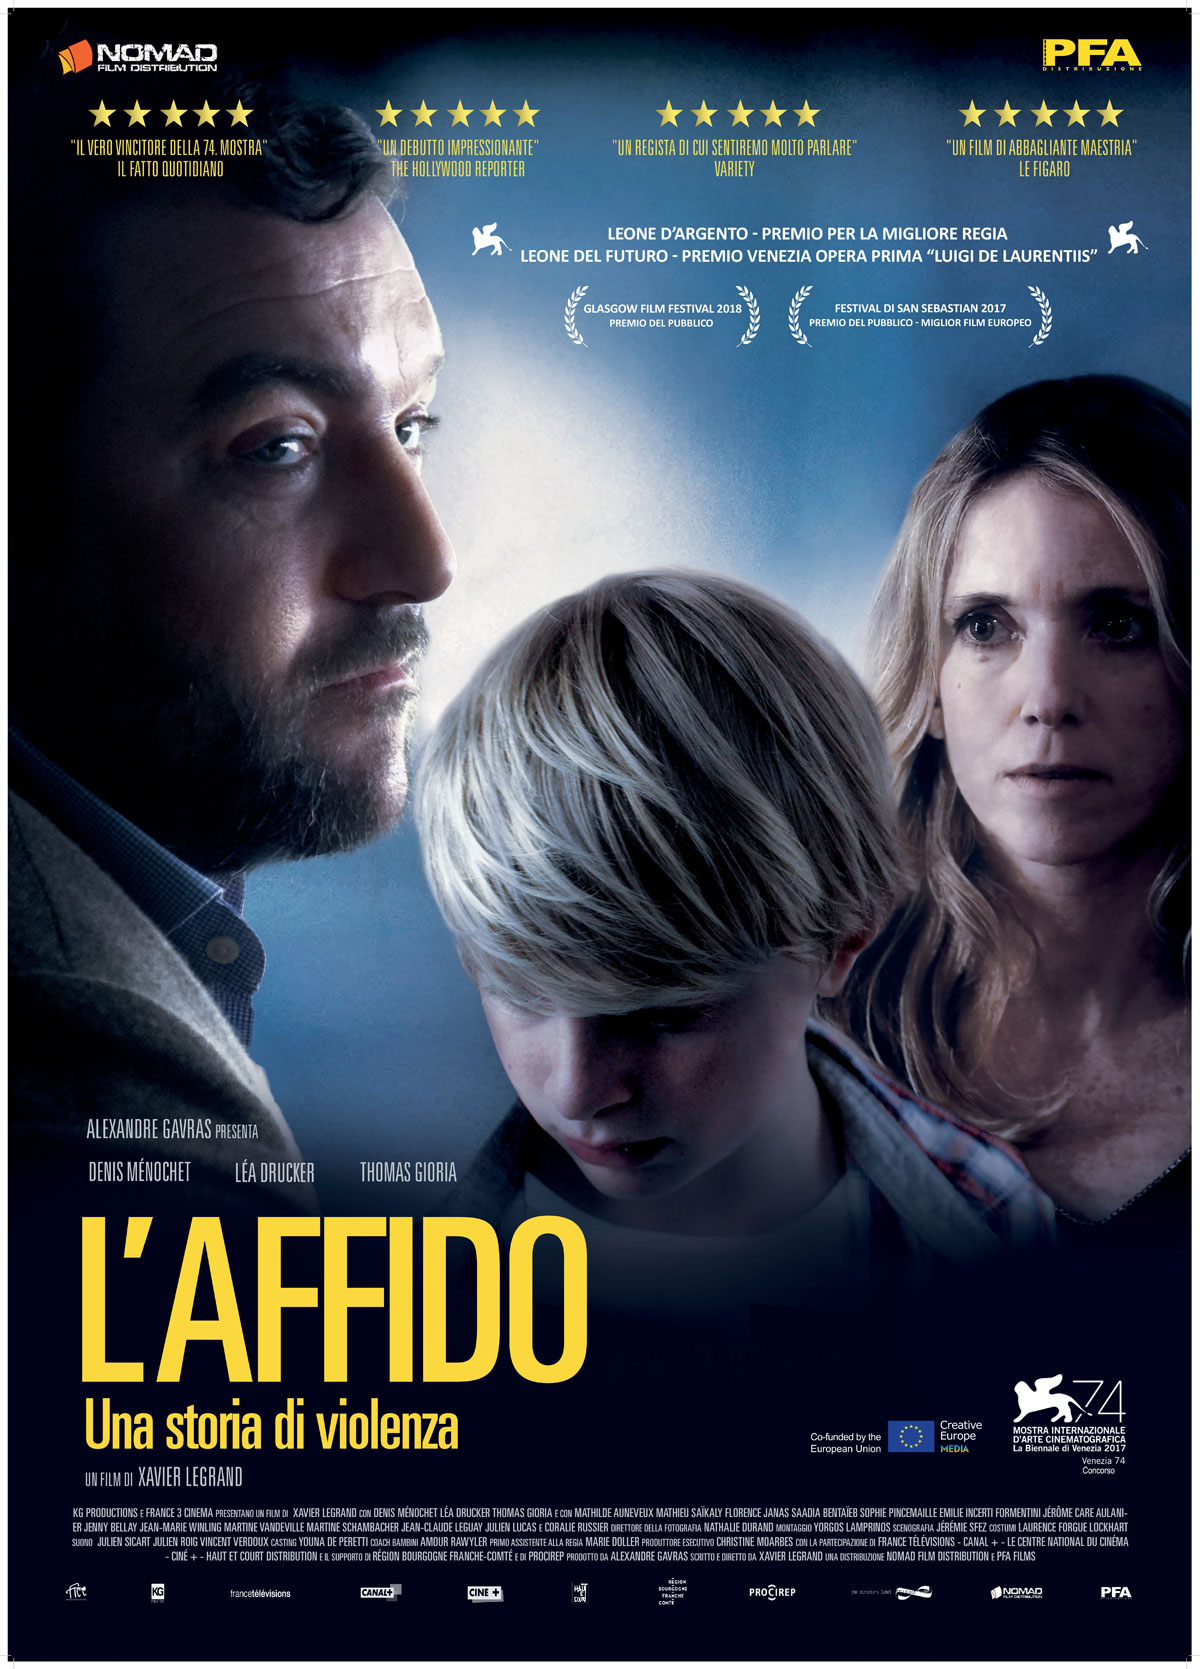 L'affido, una storia di violenza di Xavier Legrand